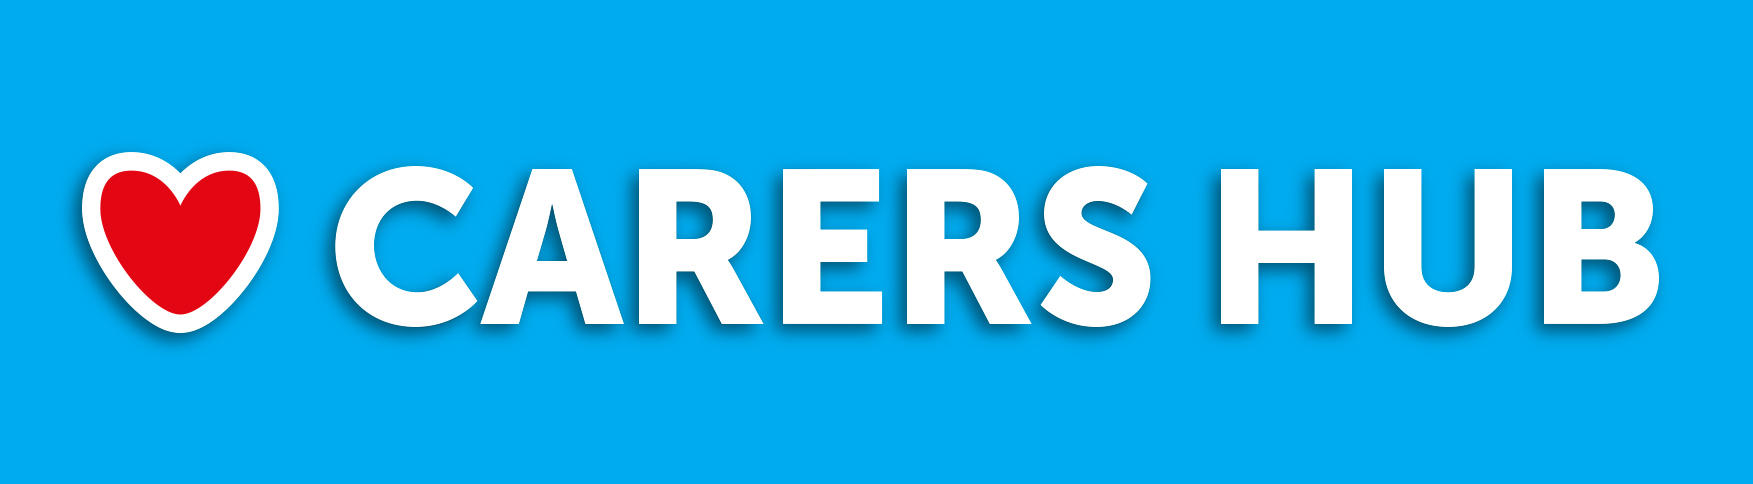 Carers Hub Button